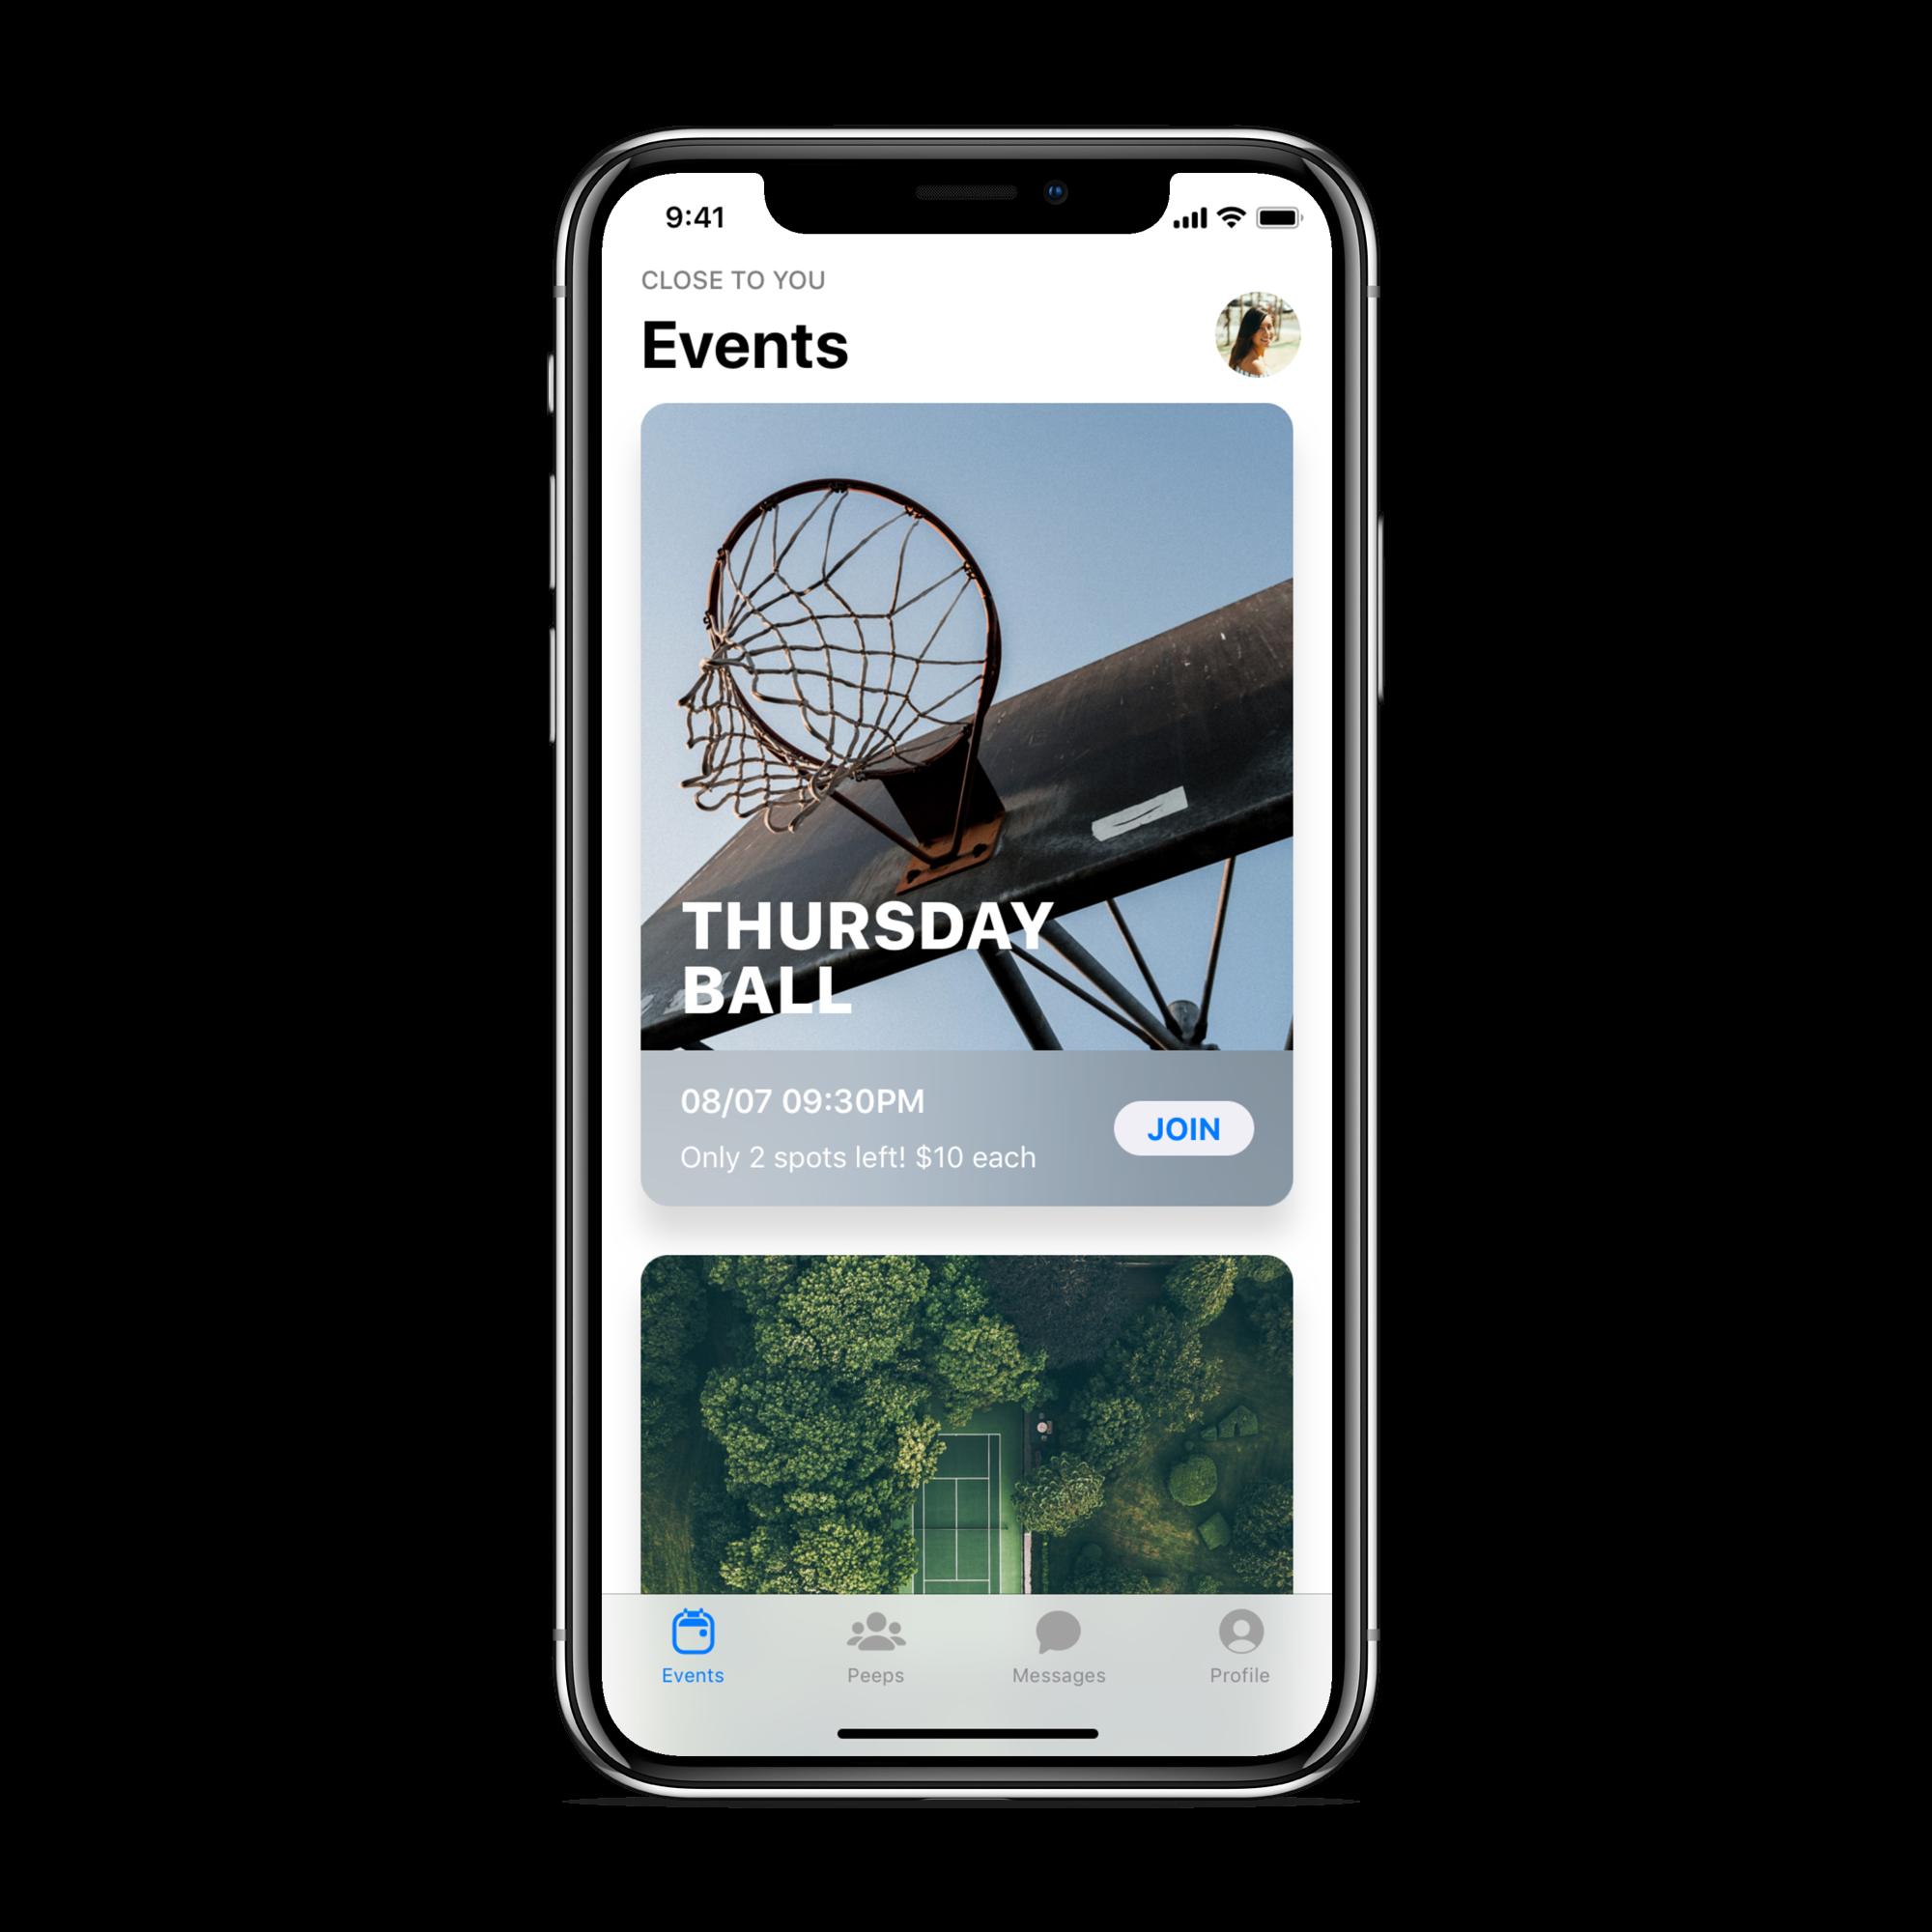 EventsiPhoneX.png